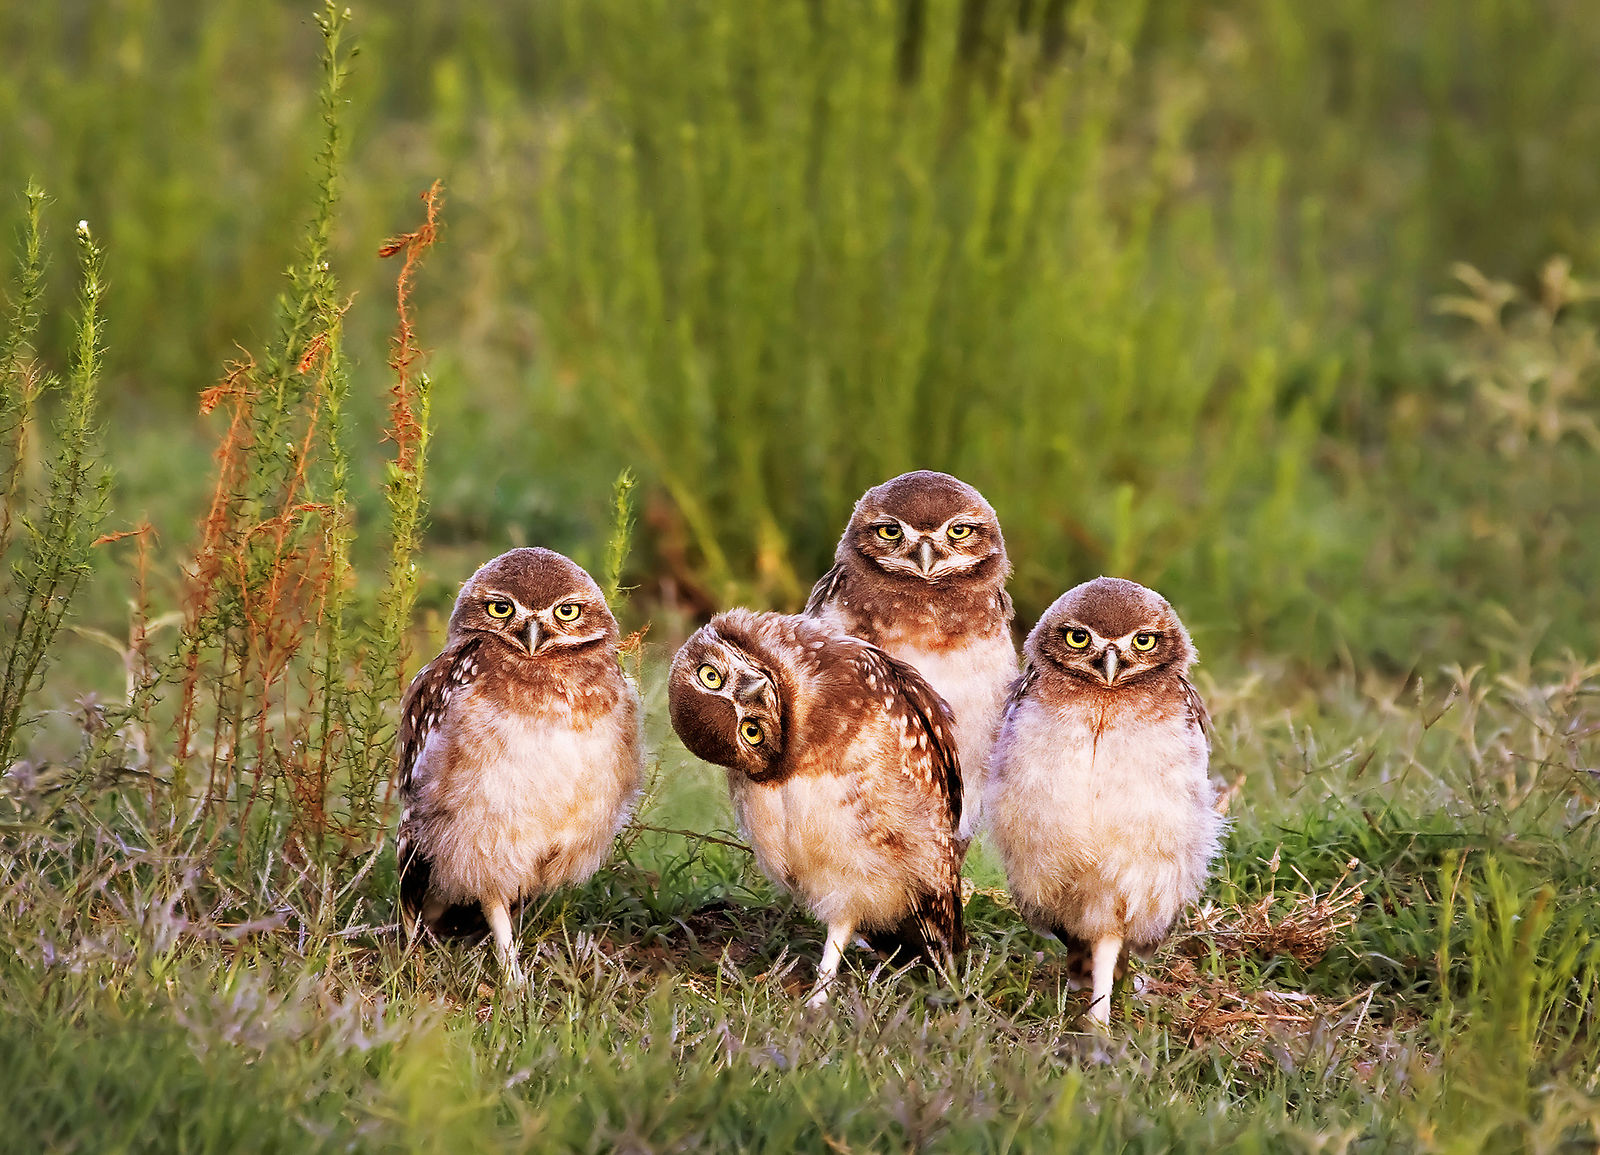 Comedy Wildlife Photography Awards 2016